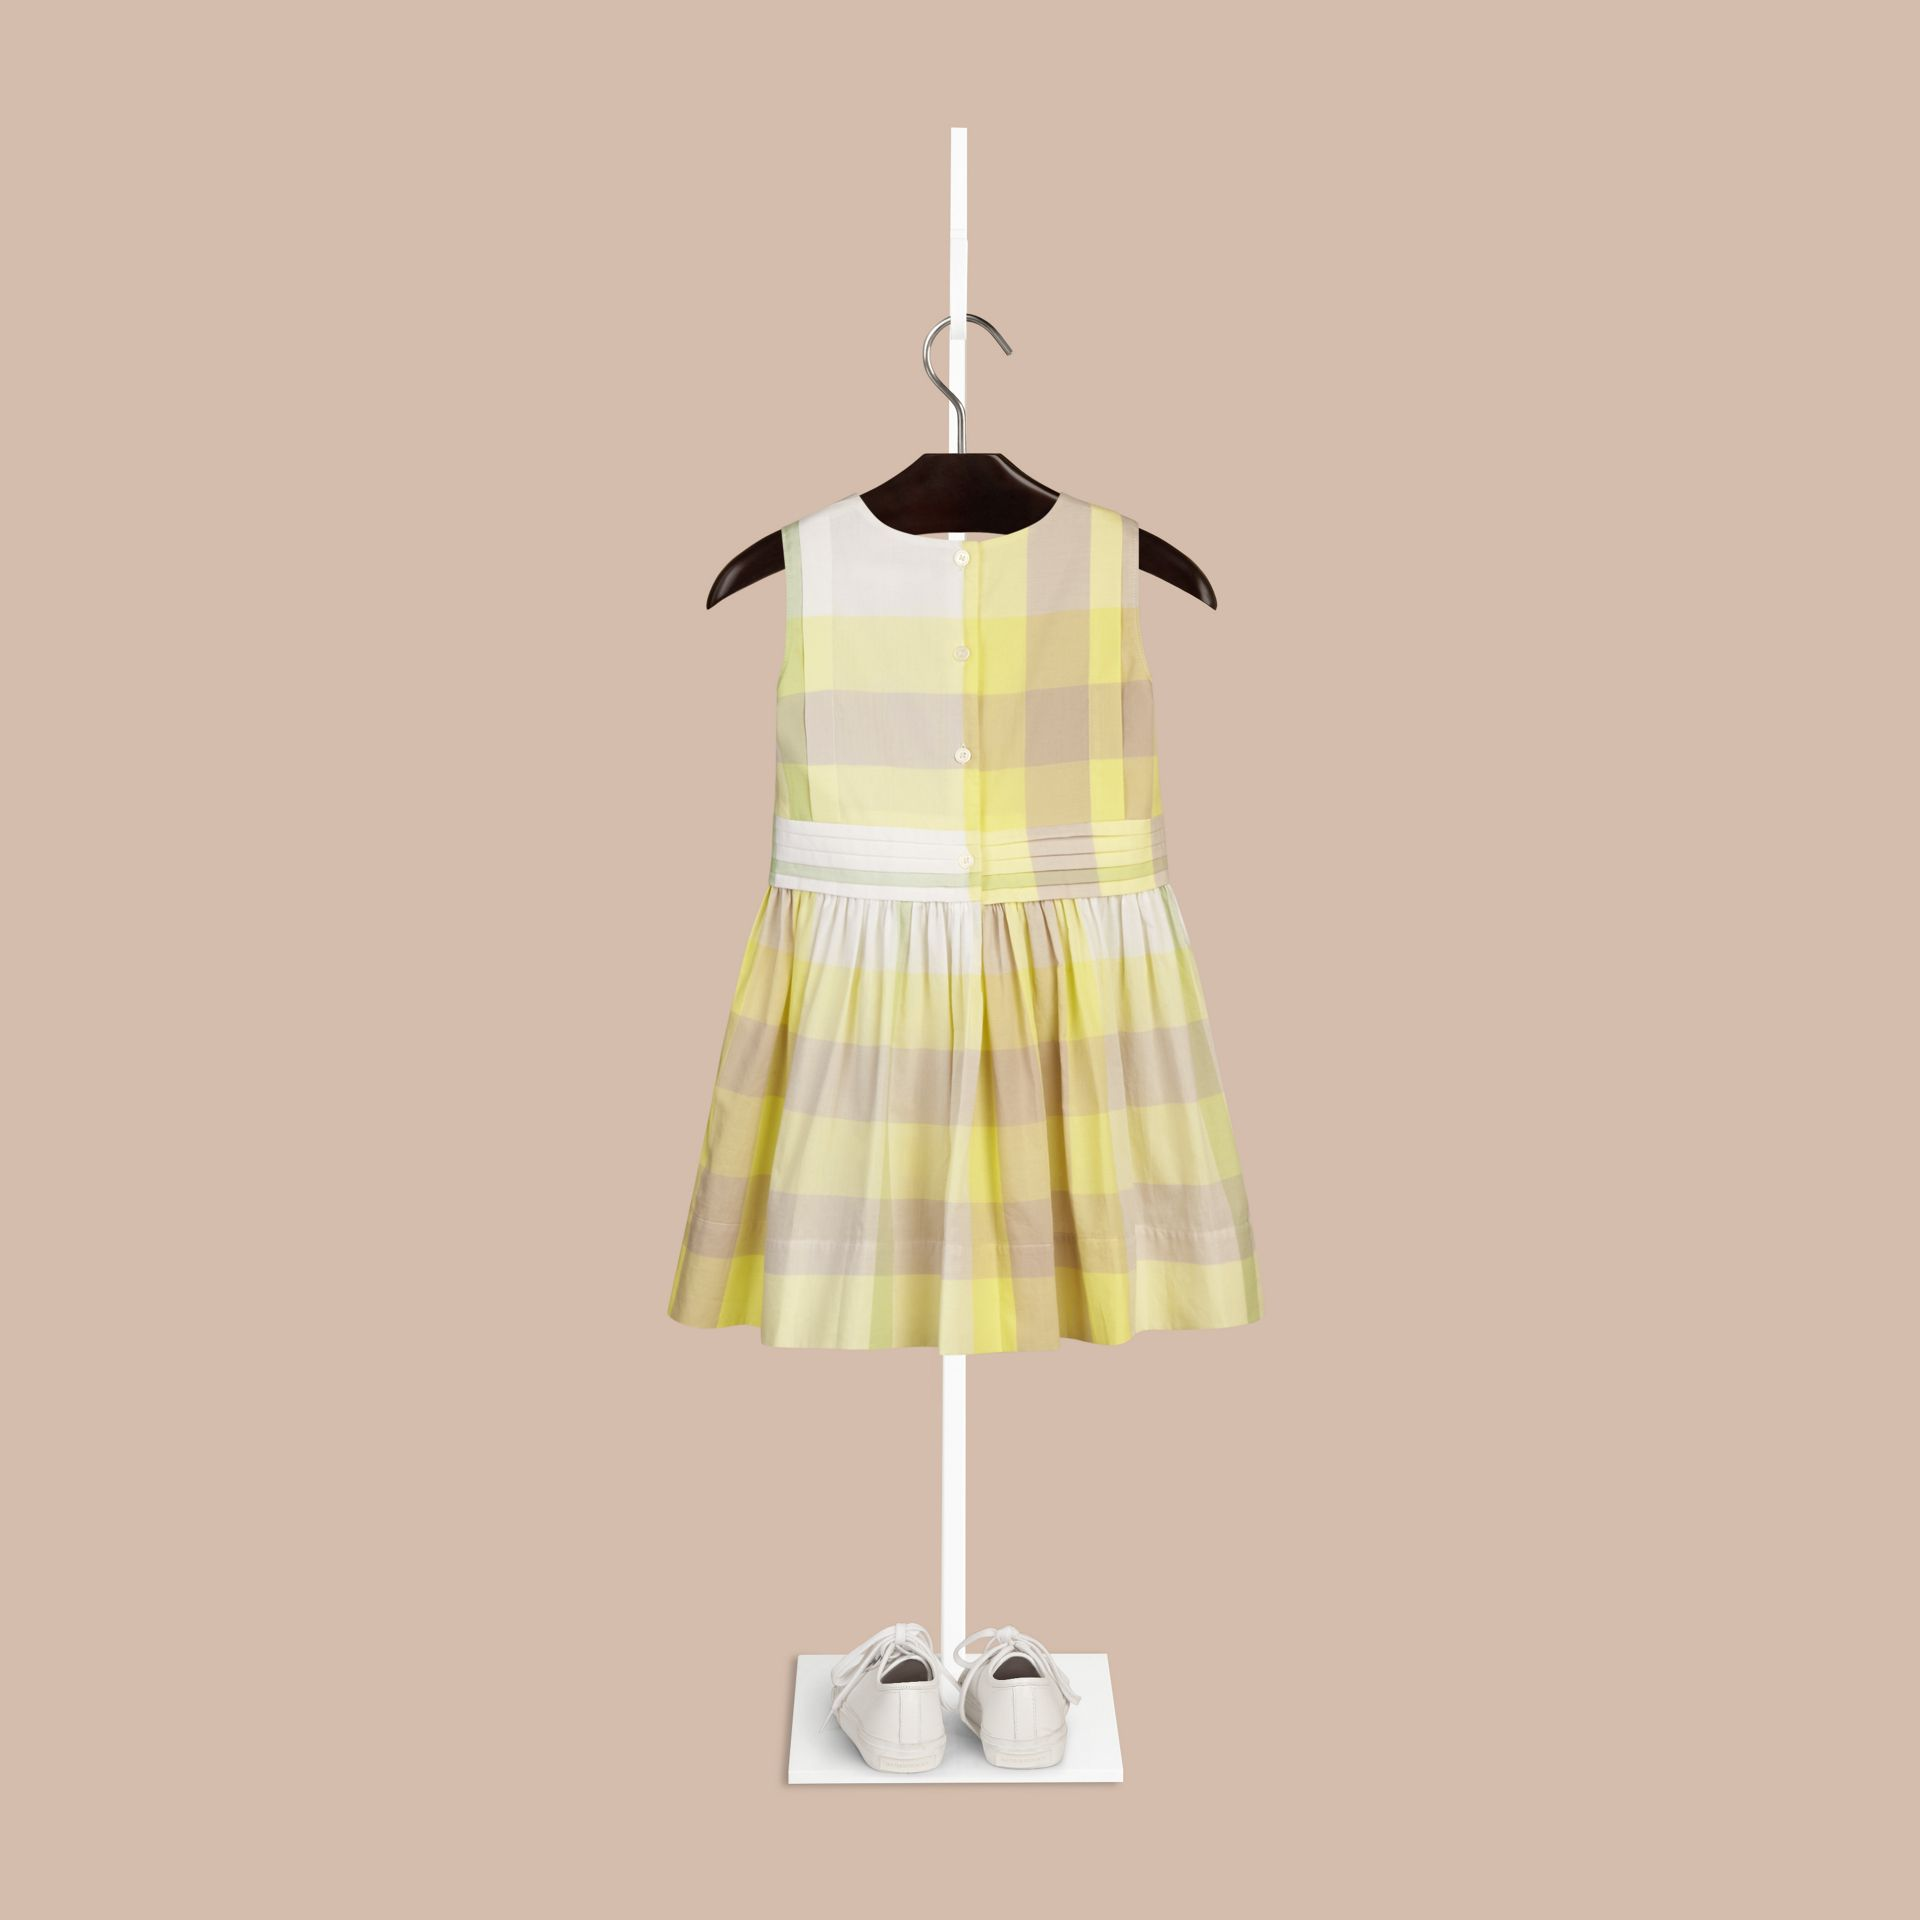 Helles zitronengelb Ärmelloses Baumwollkleid mit Check-Muster Helles Zitronengelb - Galerie-Bild 2